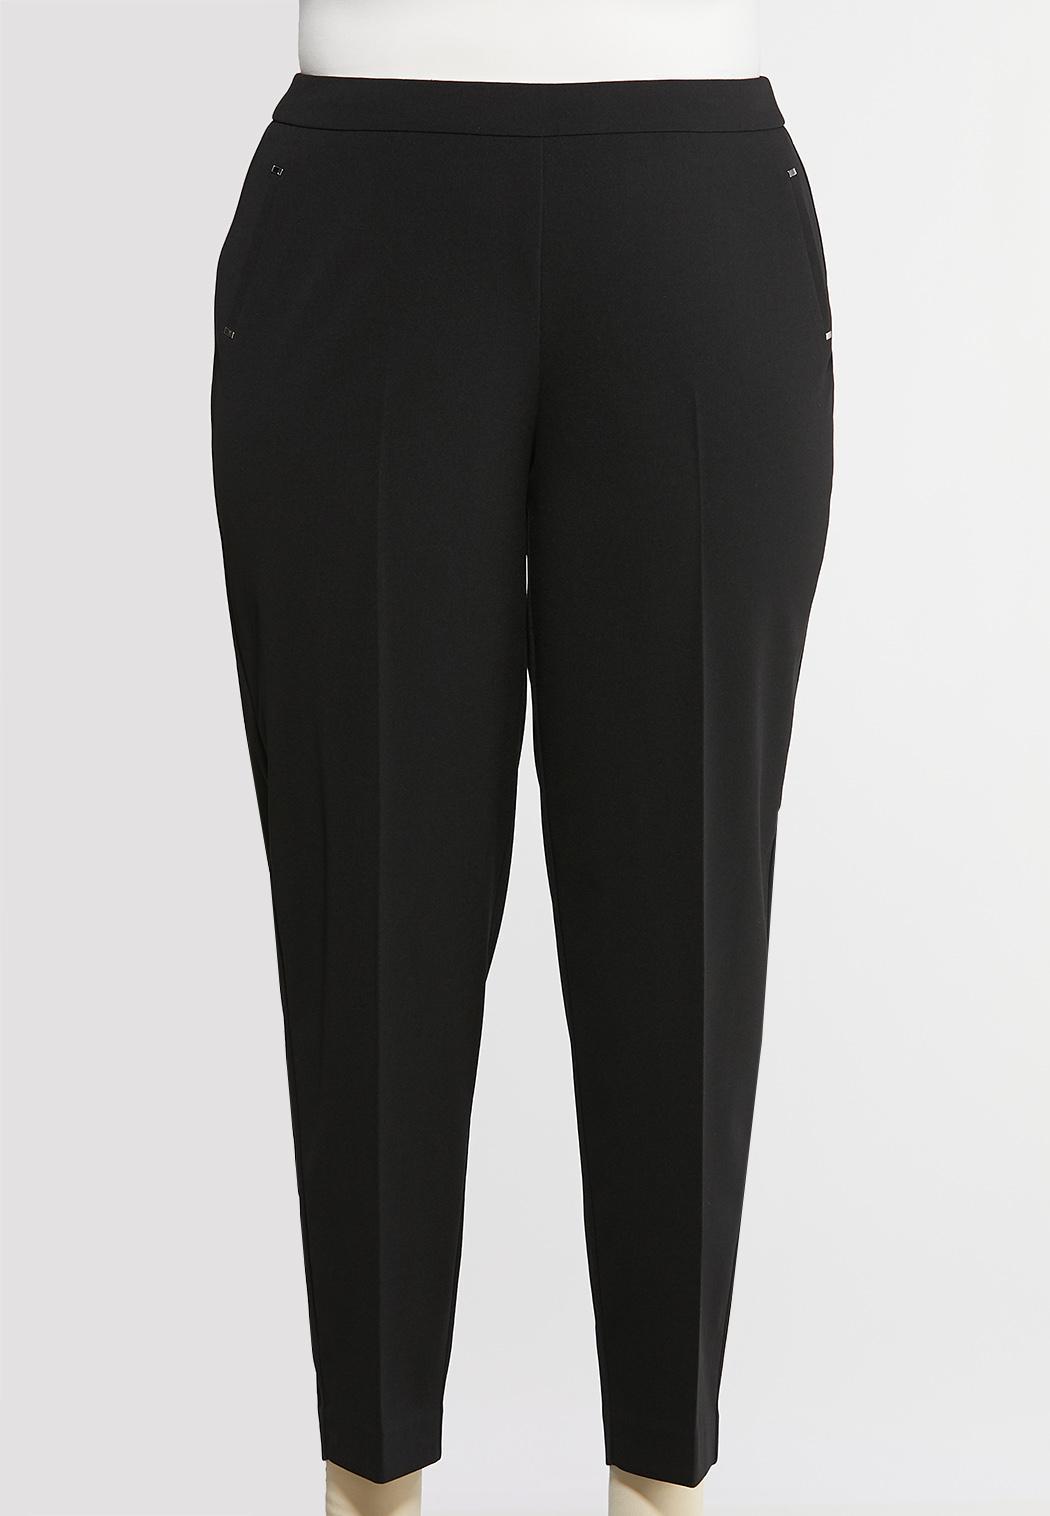 6dbb1be8ad883 Women's Plus Size Pants